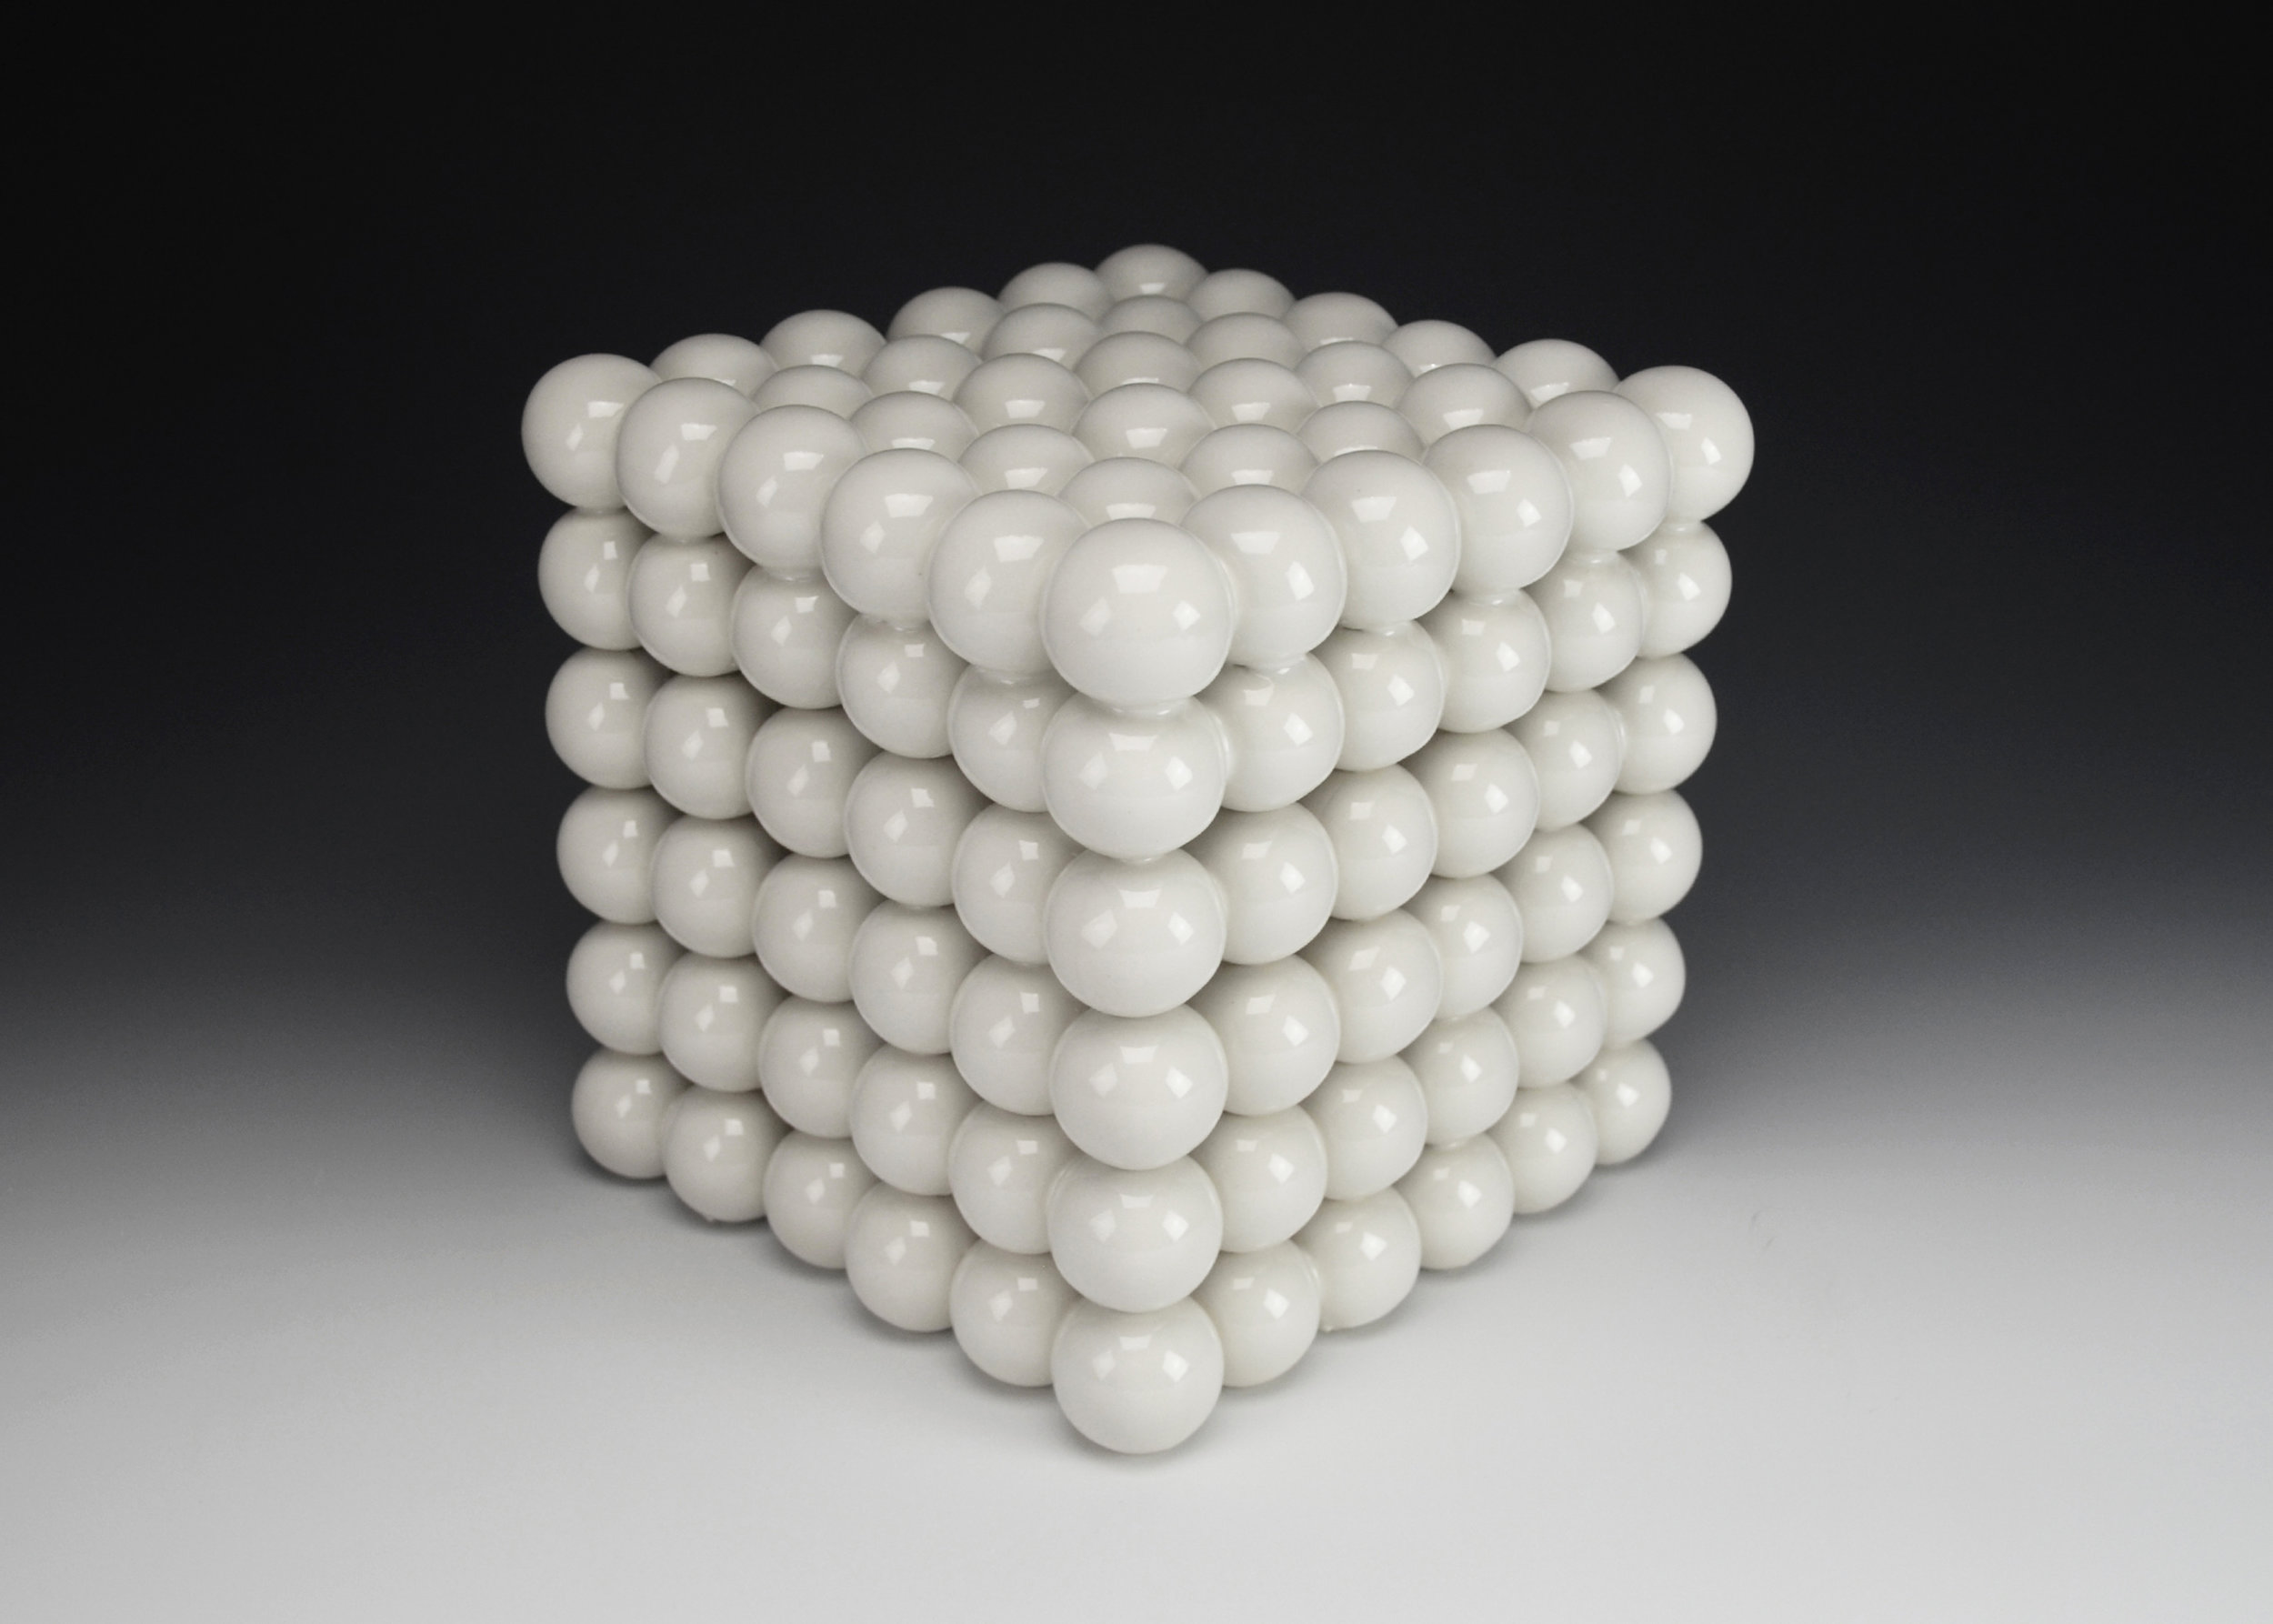 Ionic Series: Construction IX  |  8 x 8 x 8 inches  |  Porcelain, Glaze  |  2017